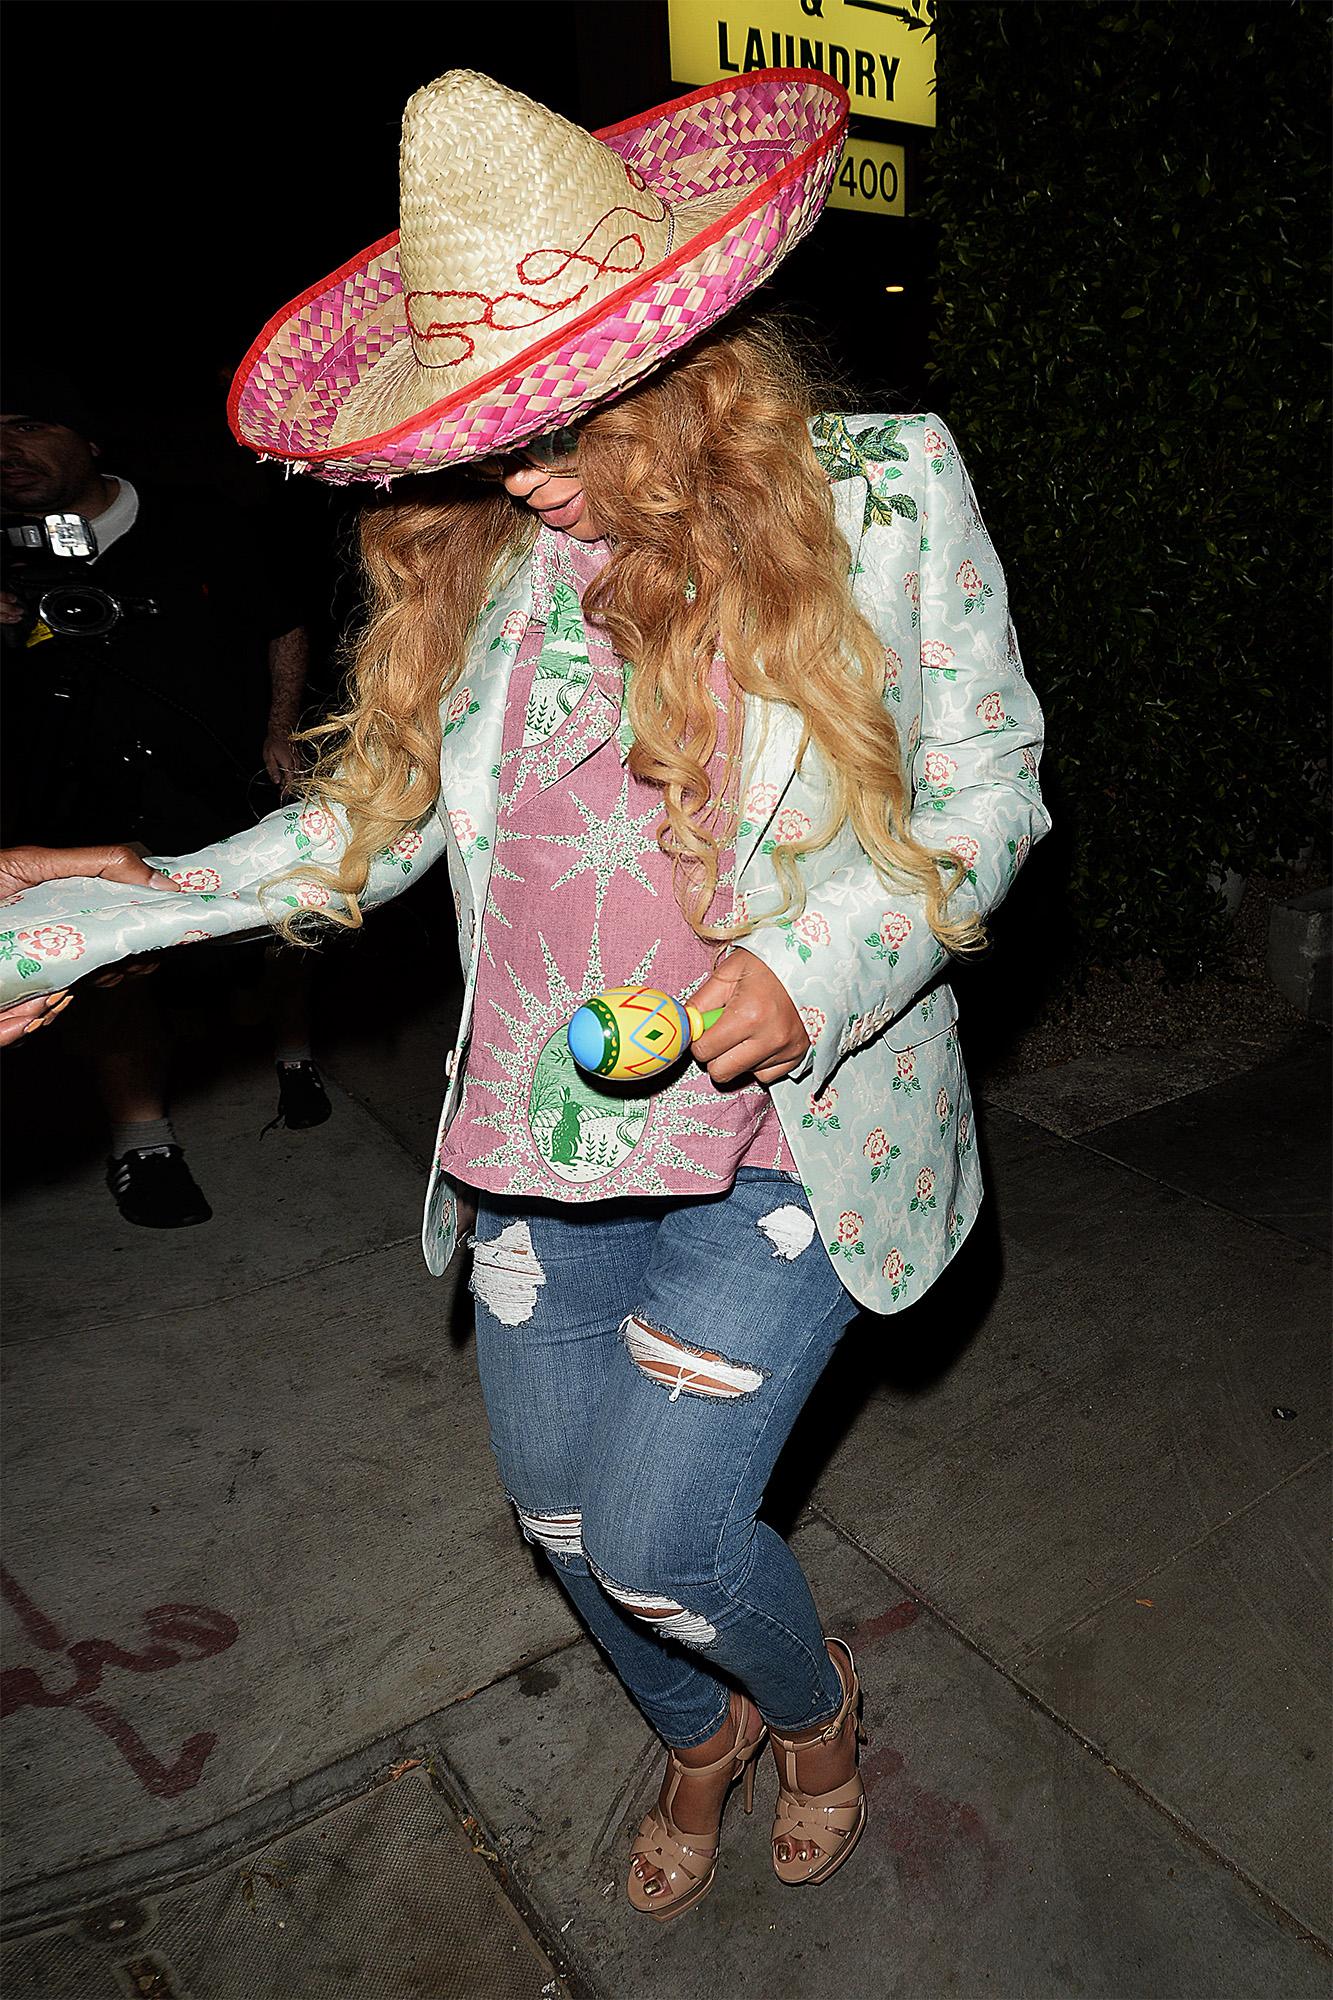 Beyonce Kelly Rowland Wear Sombreros For Cinco De Mayo Dinner